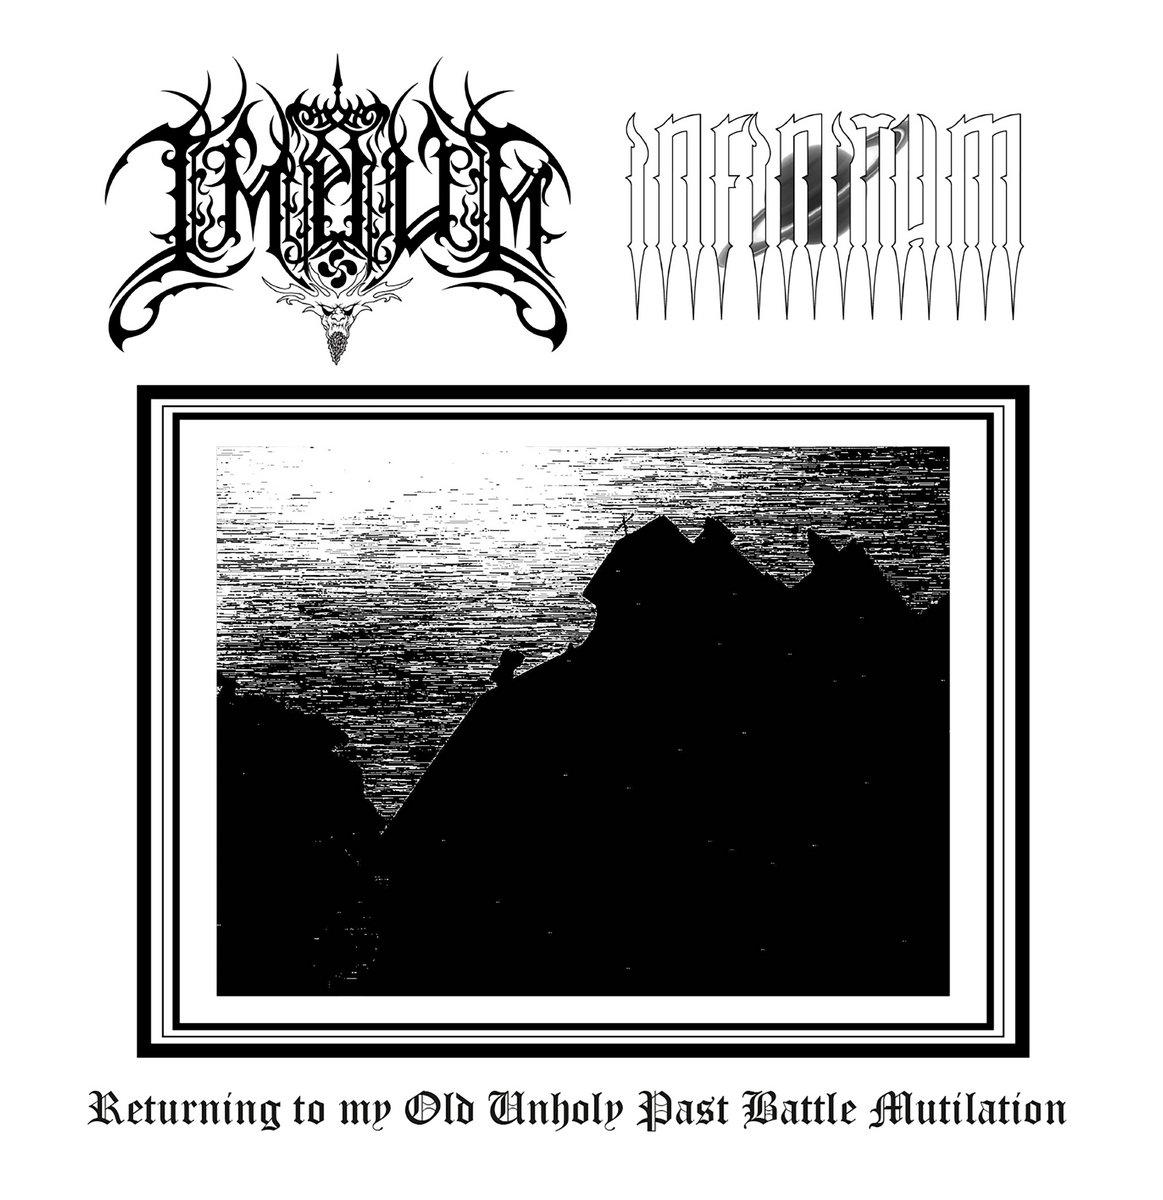 Impium / Infinitum - Returning to My Old Unholy Past Battle Mutilation